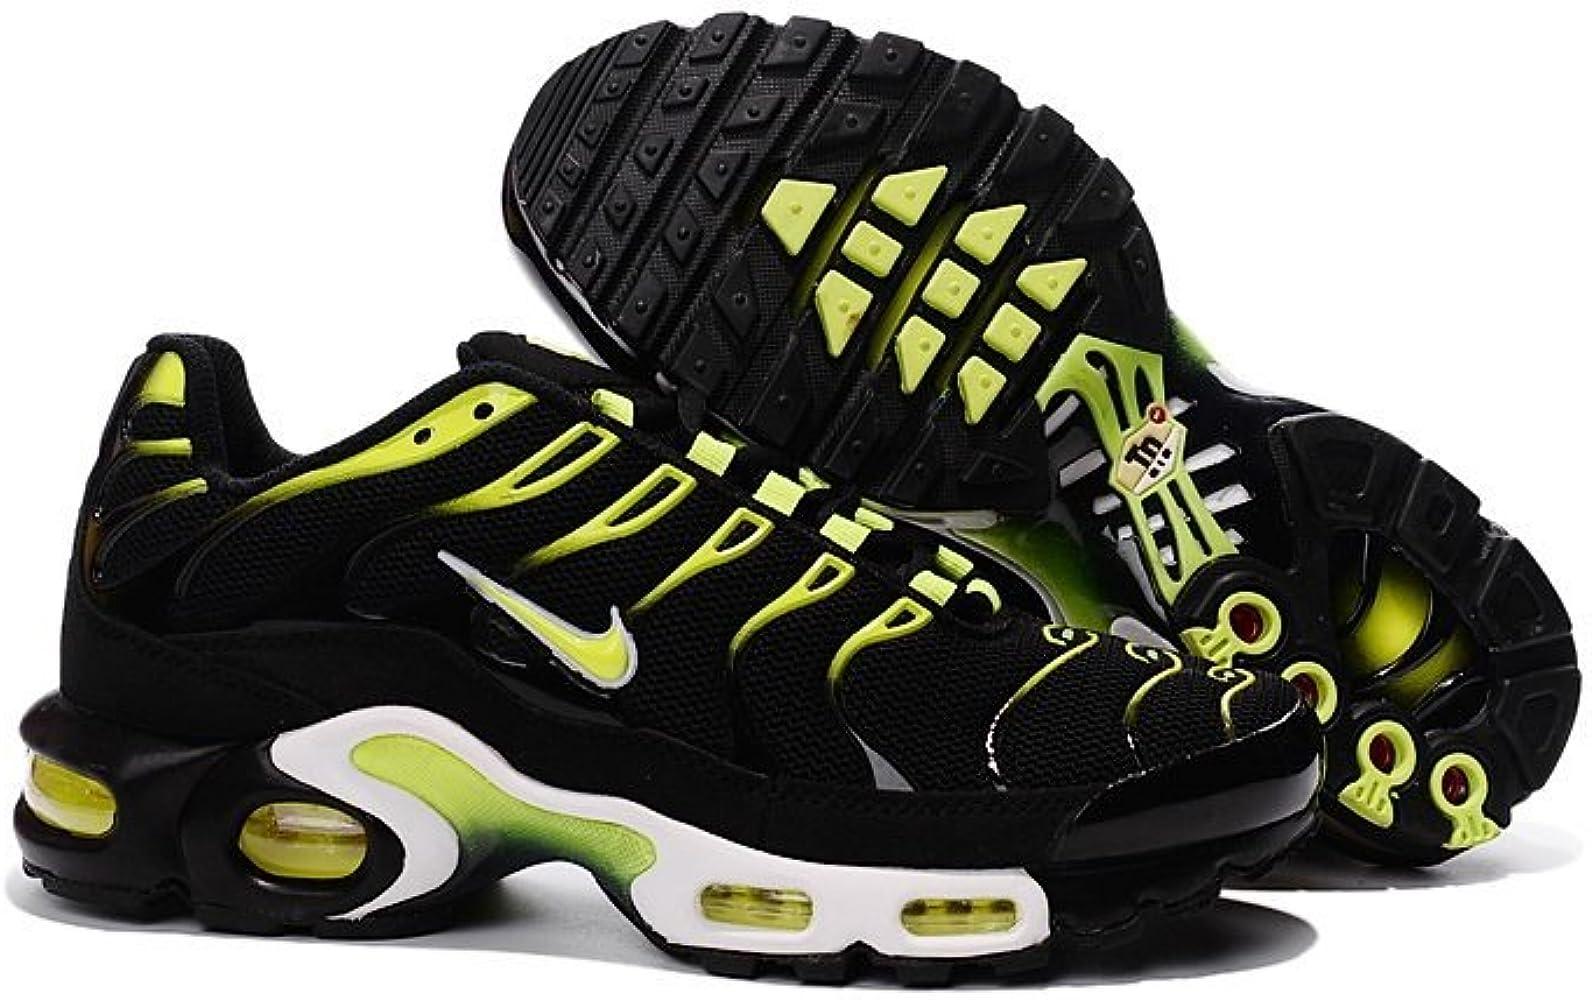 Nike Air Max Plus Noir et Jaune (39): : Chaussures